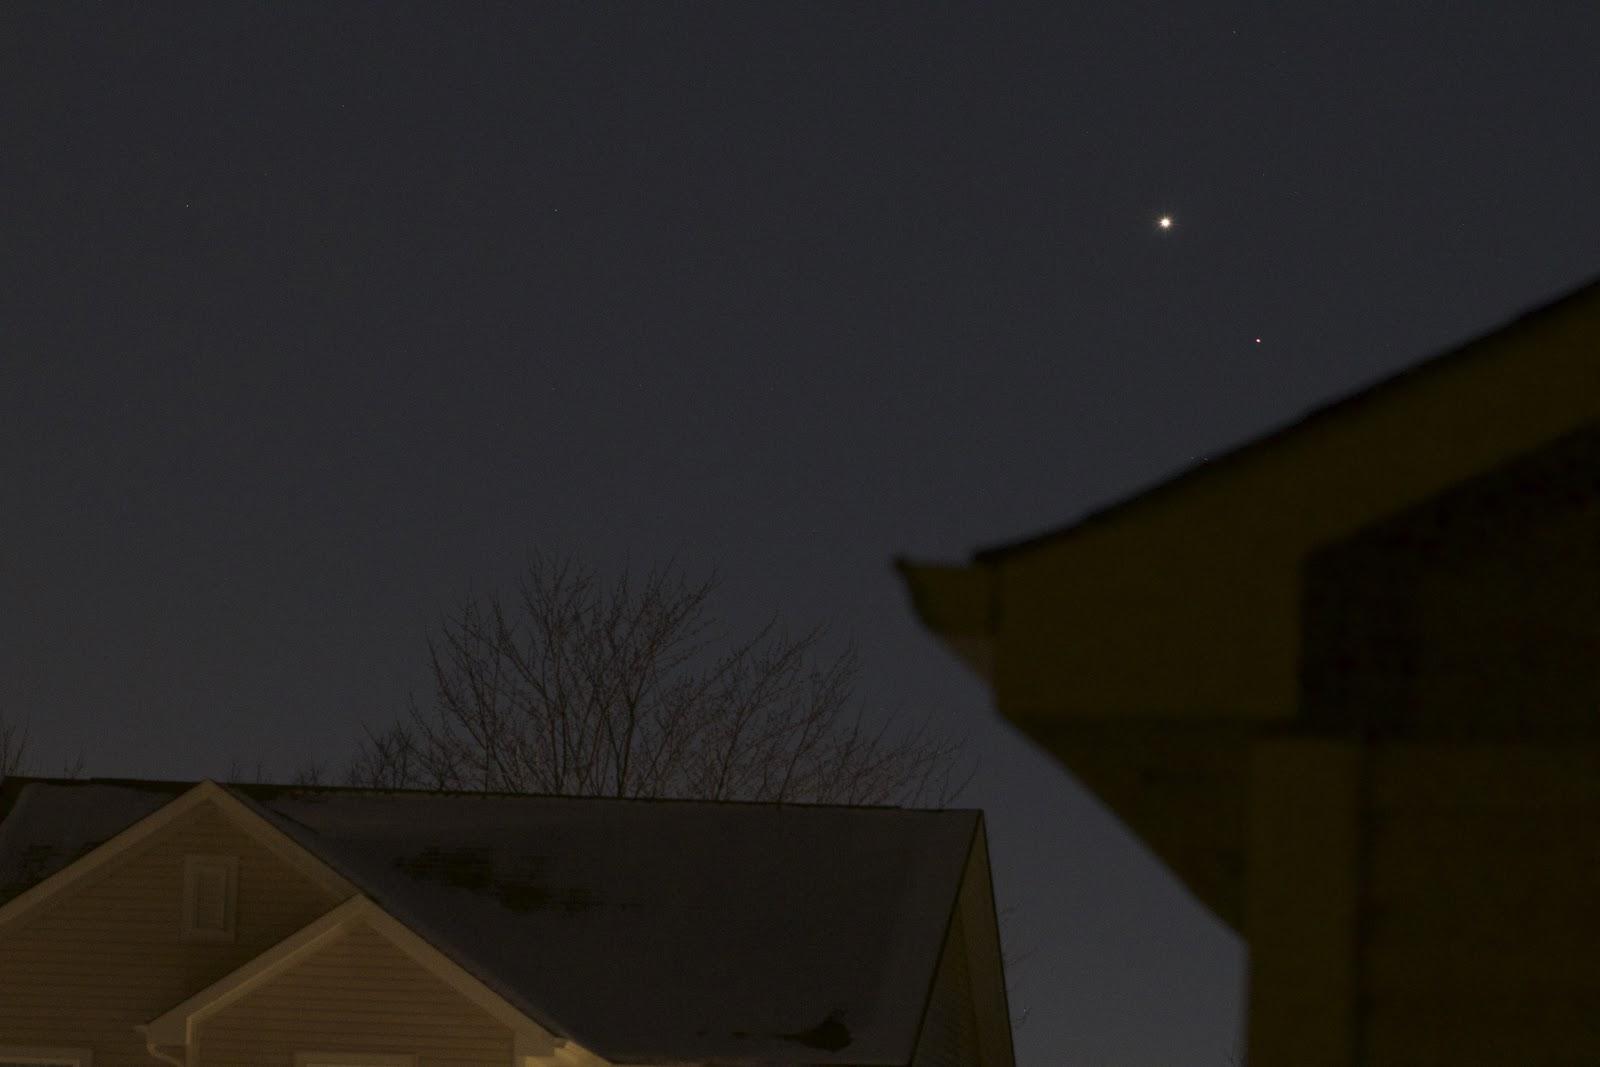 mars and venus low horizon